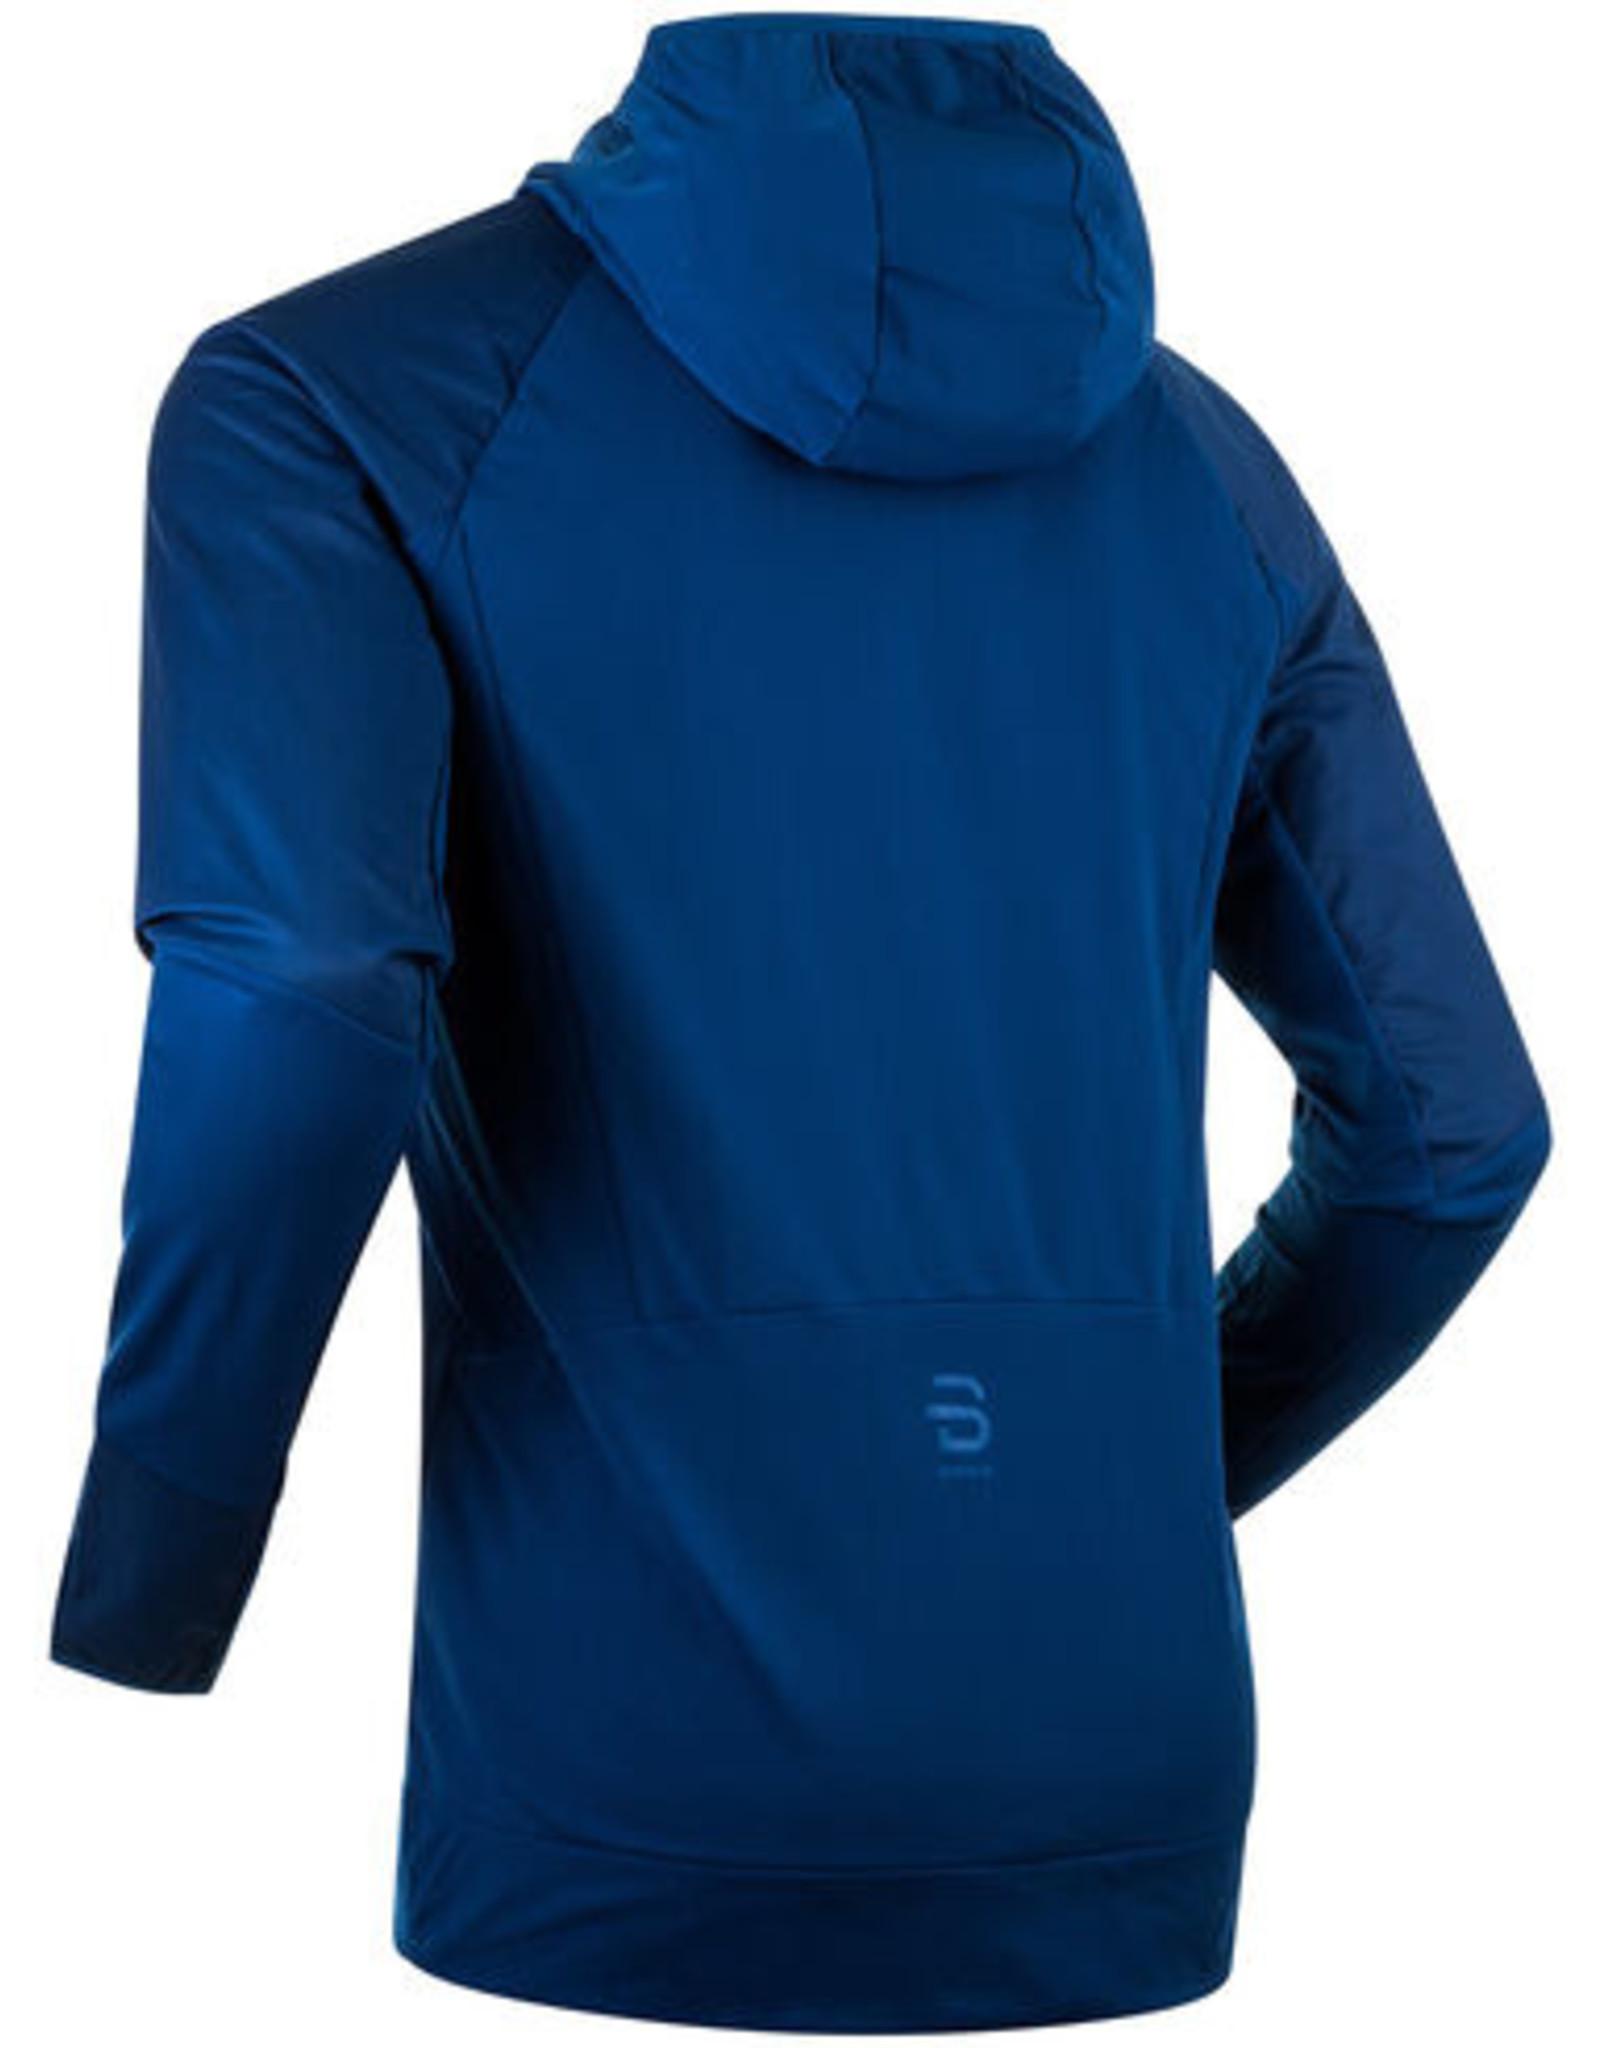 Bjorn Daehlie Men's Full Zip Sweater